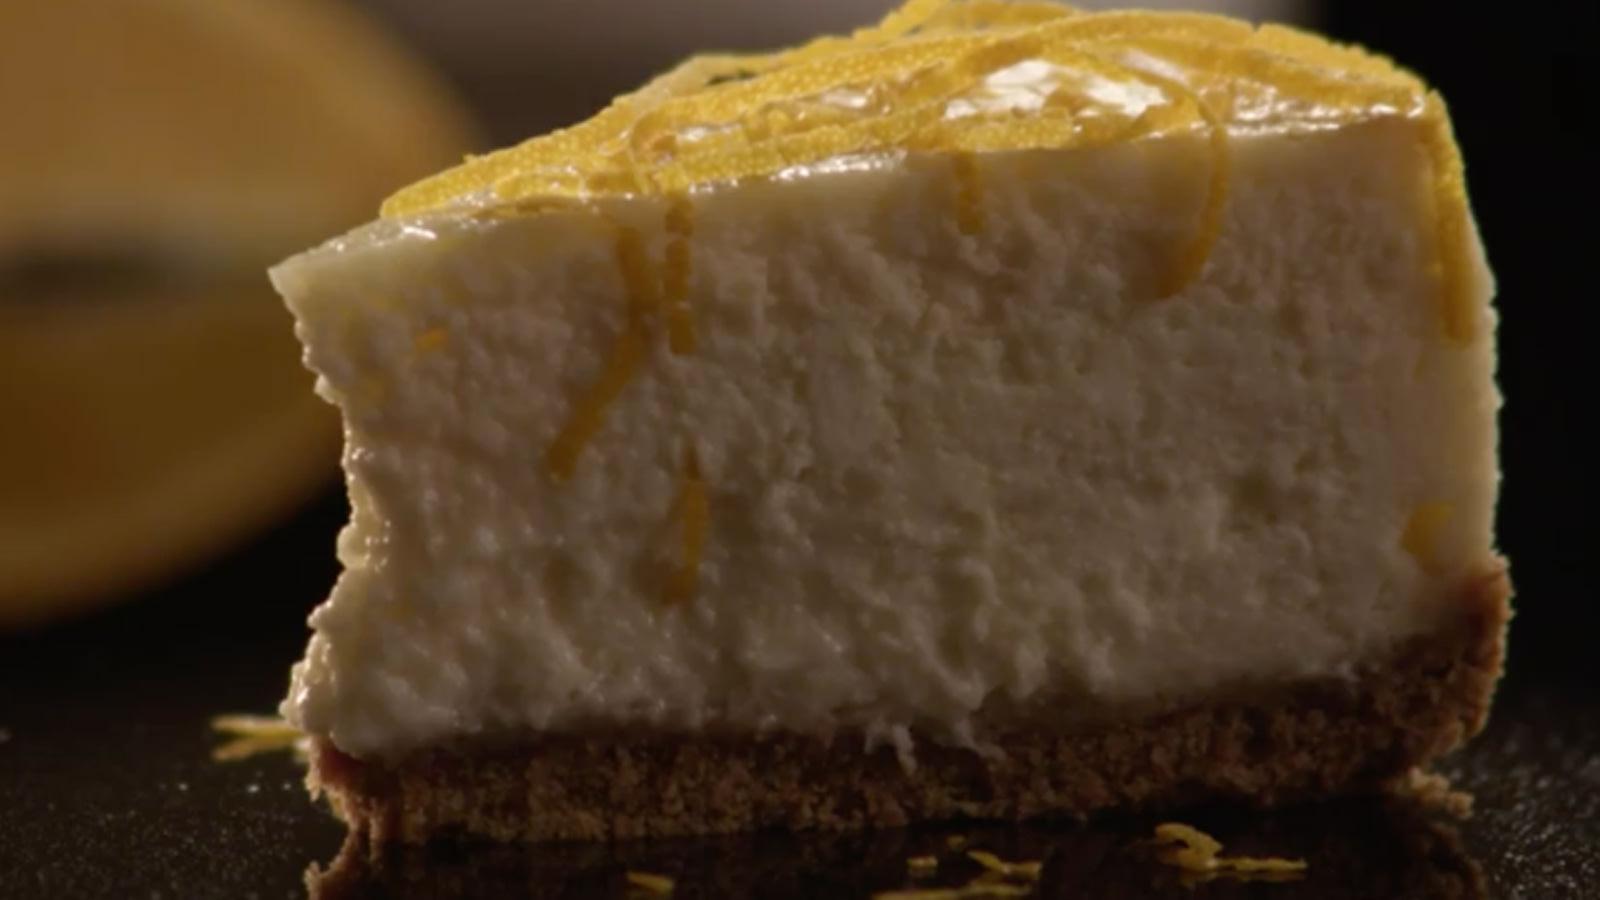 AG Recipe: Chantal's New York Cheesecake